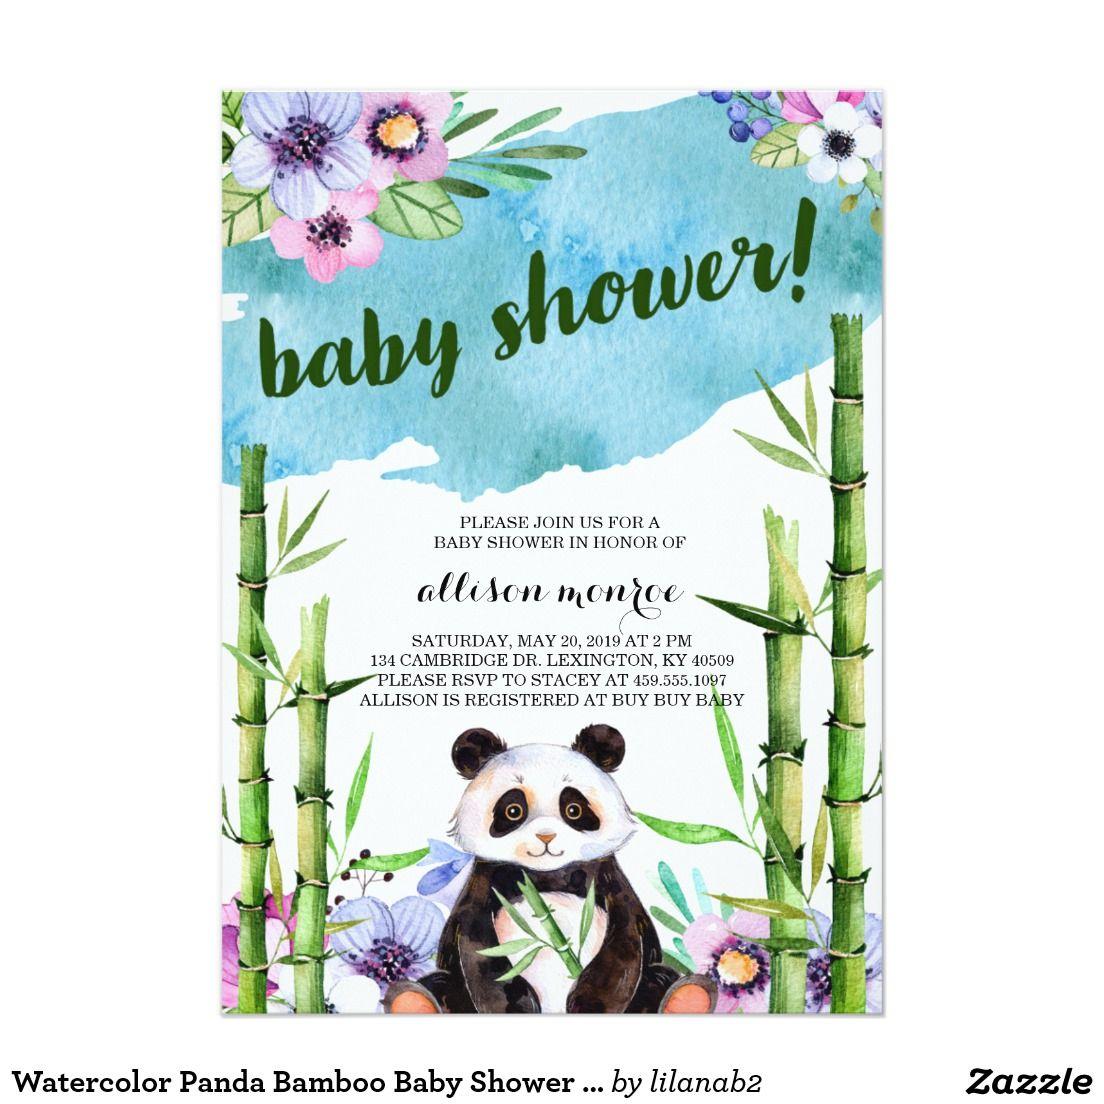 Watercolor Panda Bamboo Baby Shower Invitation   Shower invitations ...